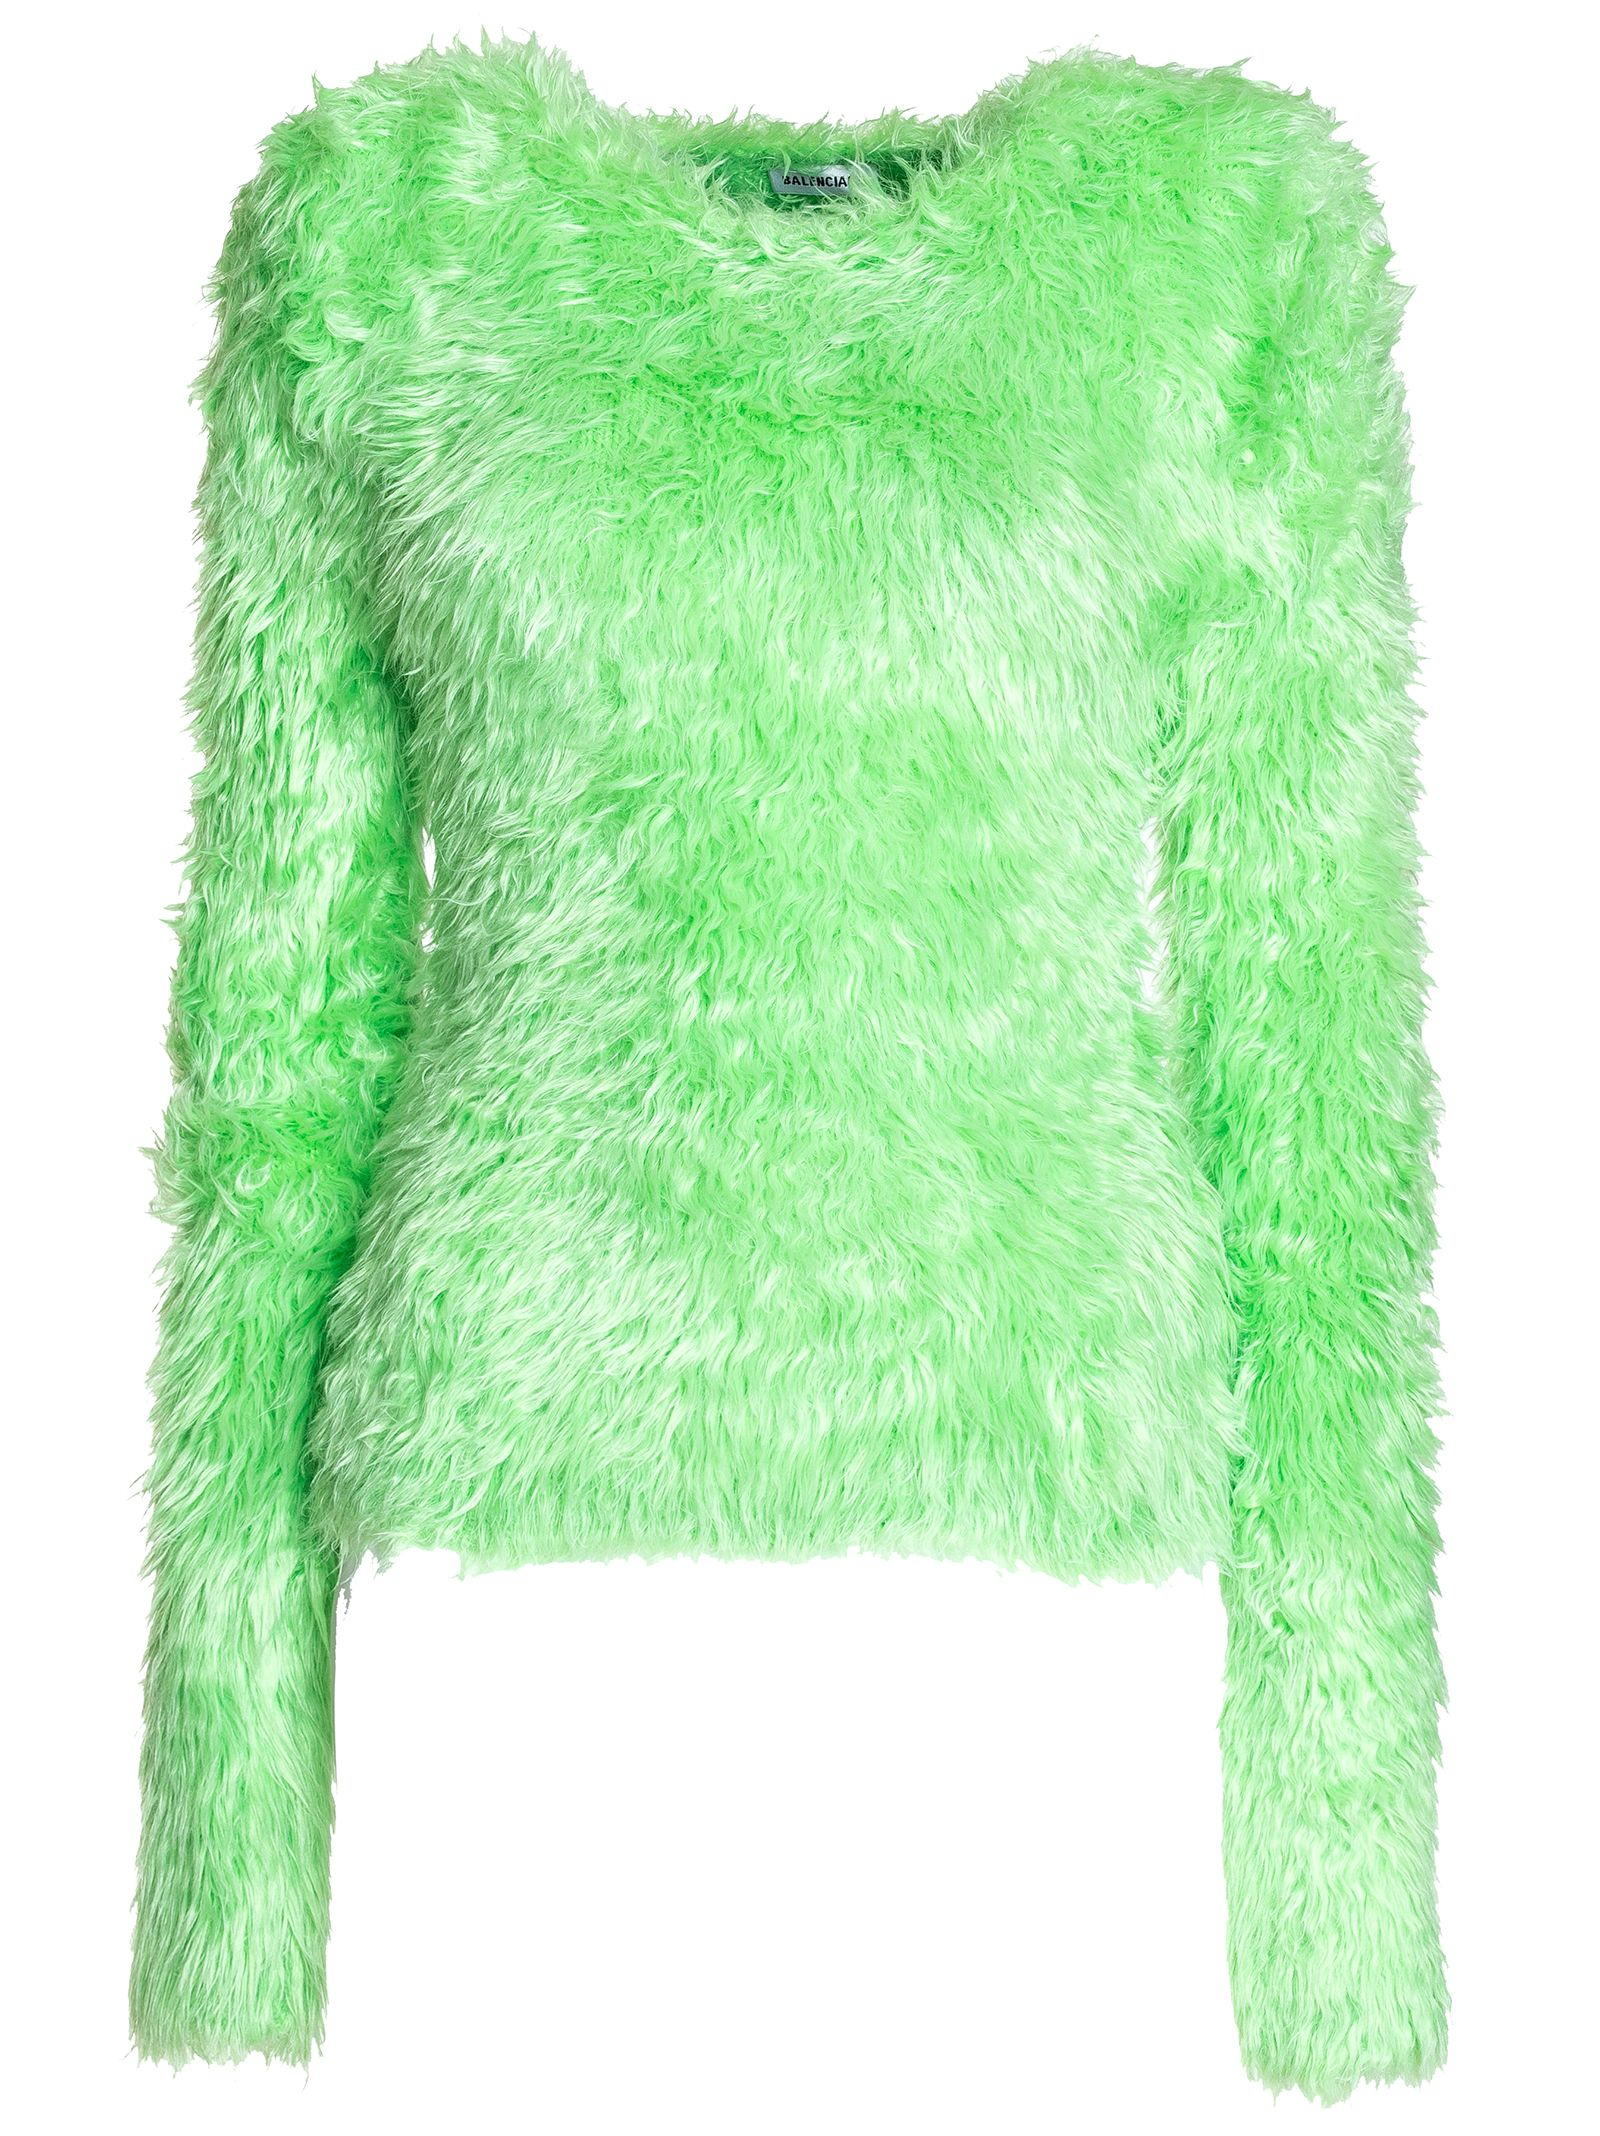 balenciaga -  Crewneck Sweater In Neon Green Fluffly Knit